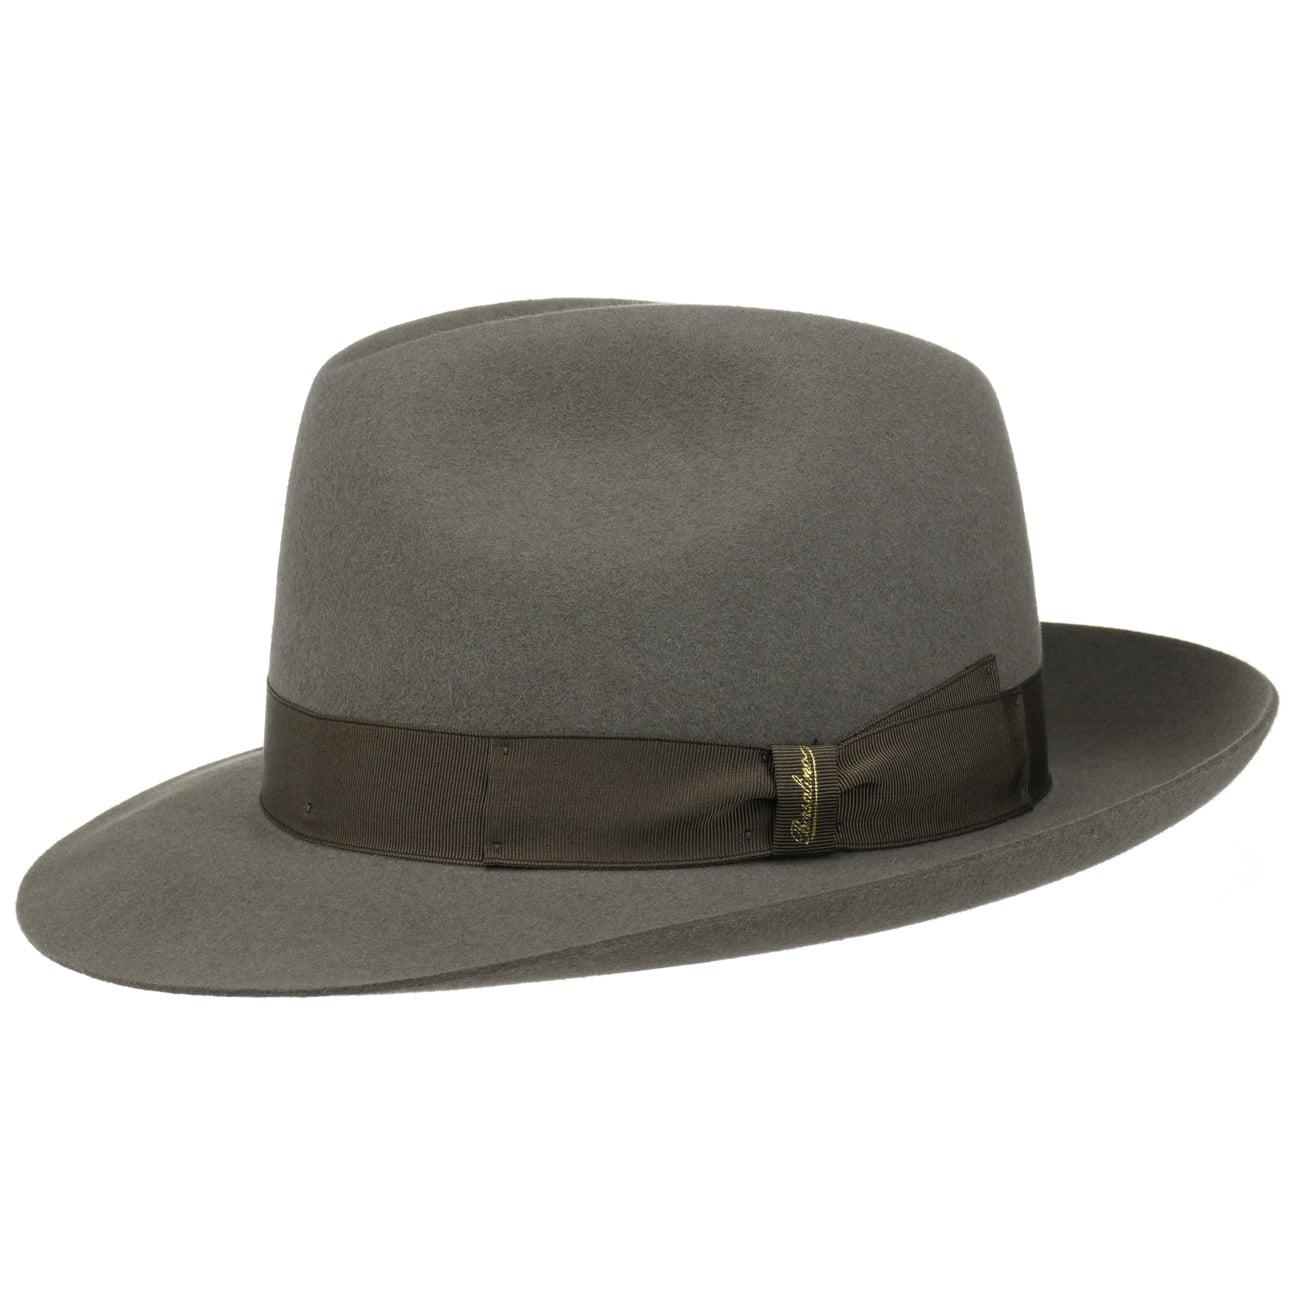 Sombrero Bogart Marengo by Borsalino